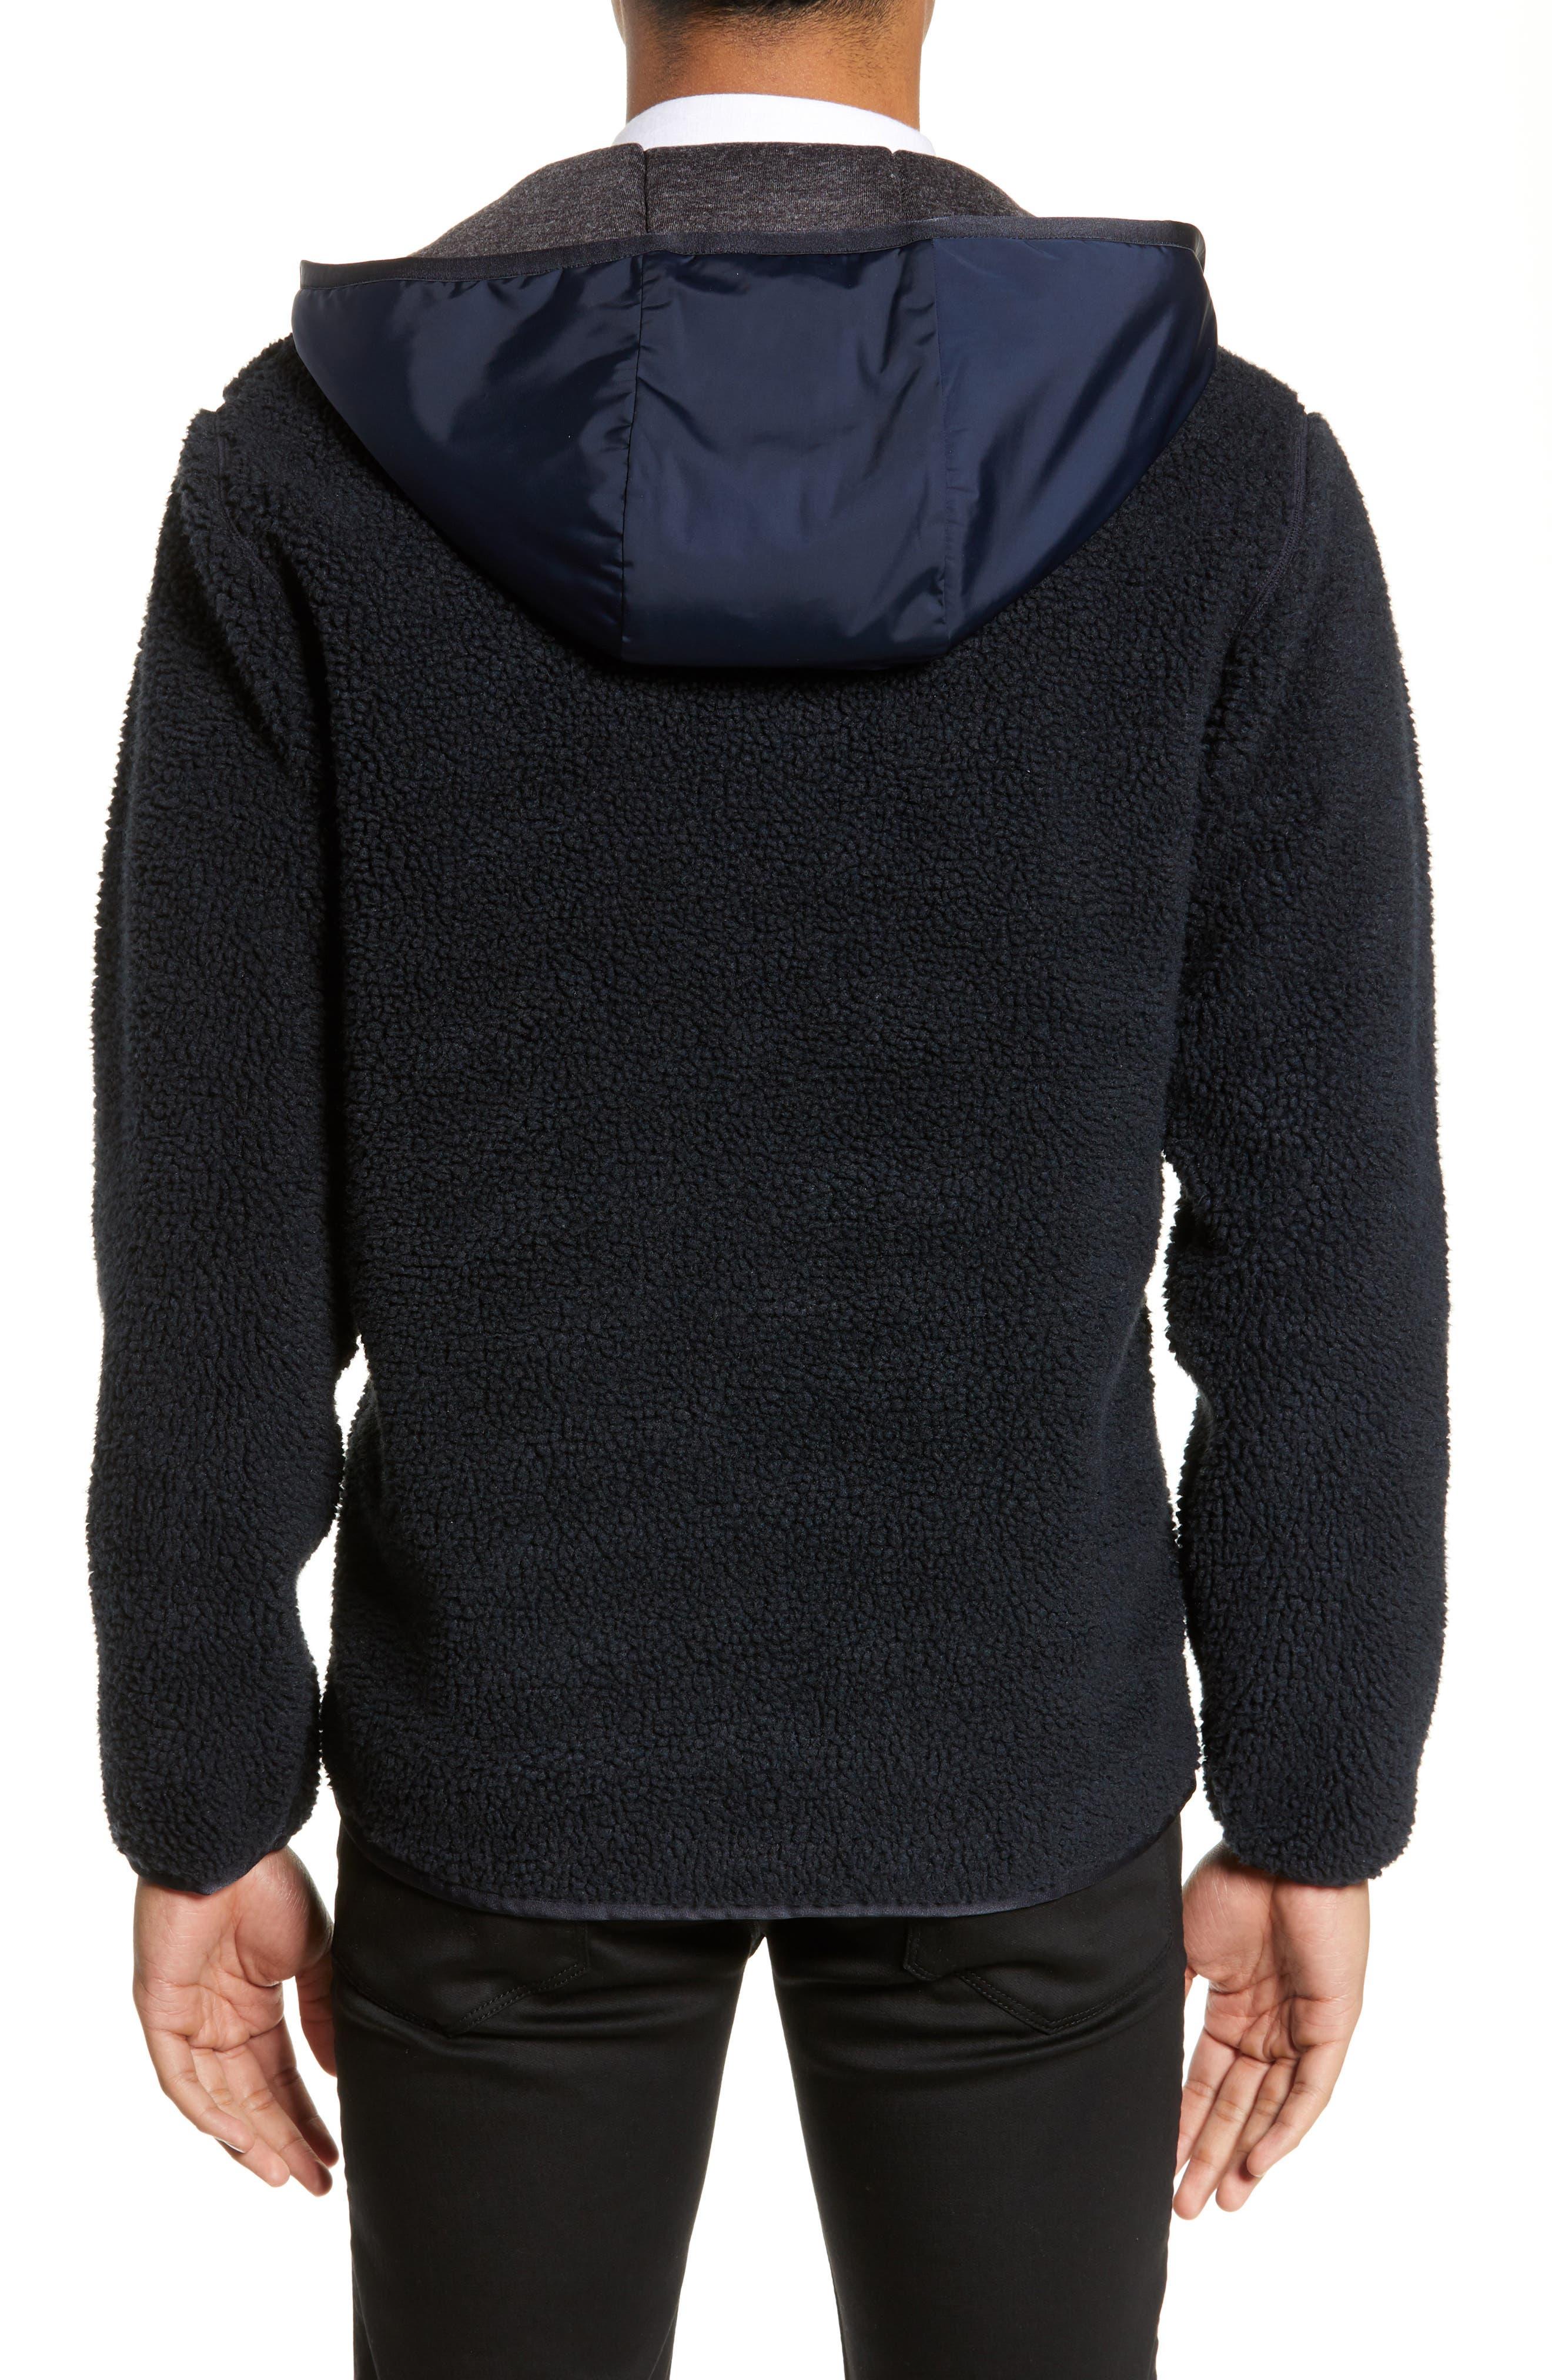 THEORY, Polar Fleece Reversible Zip Hoodie, Alternate thumbnail 4, color, 476